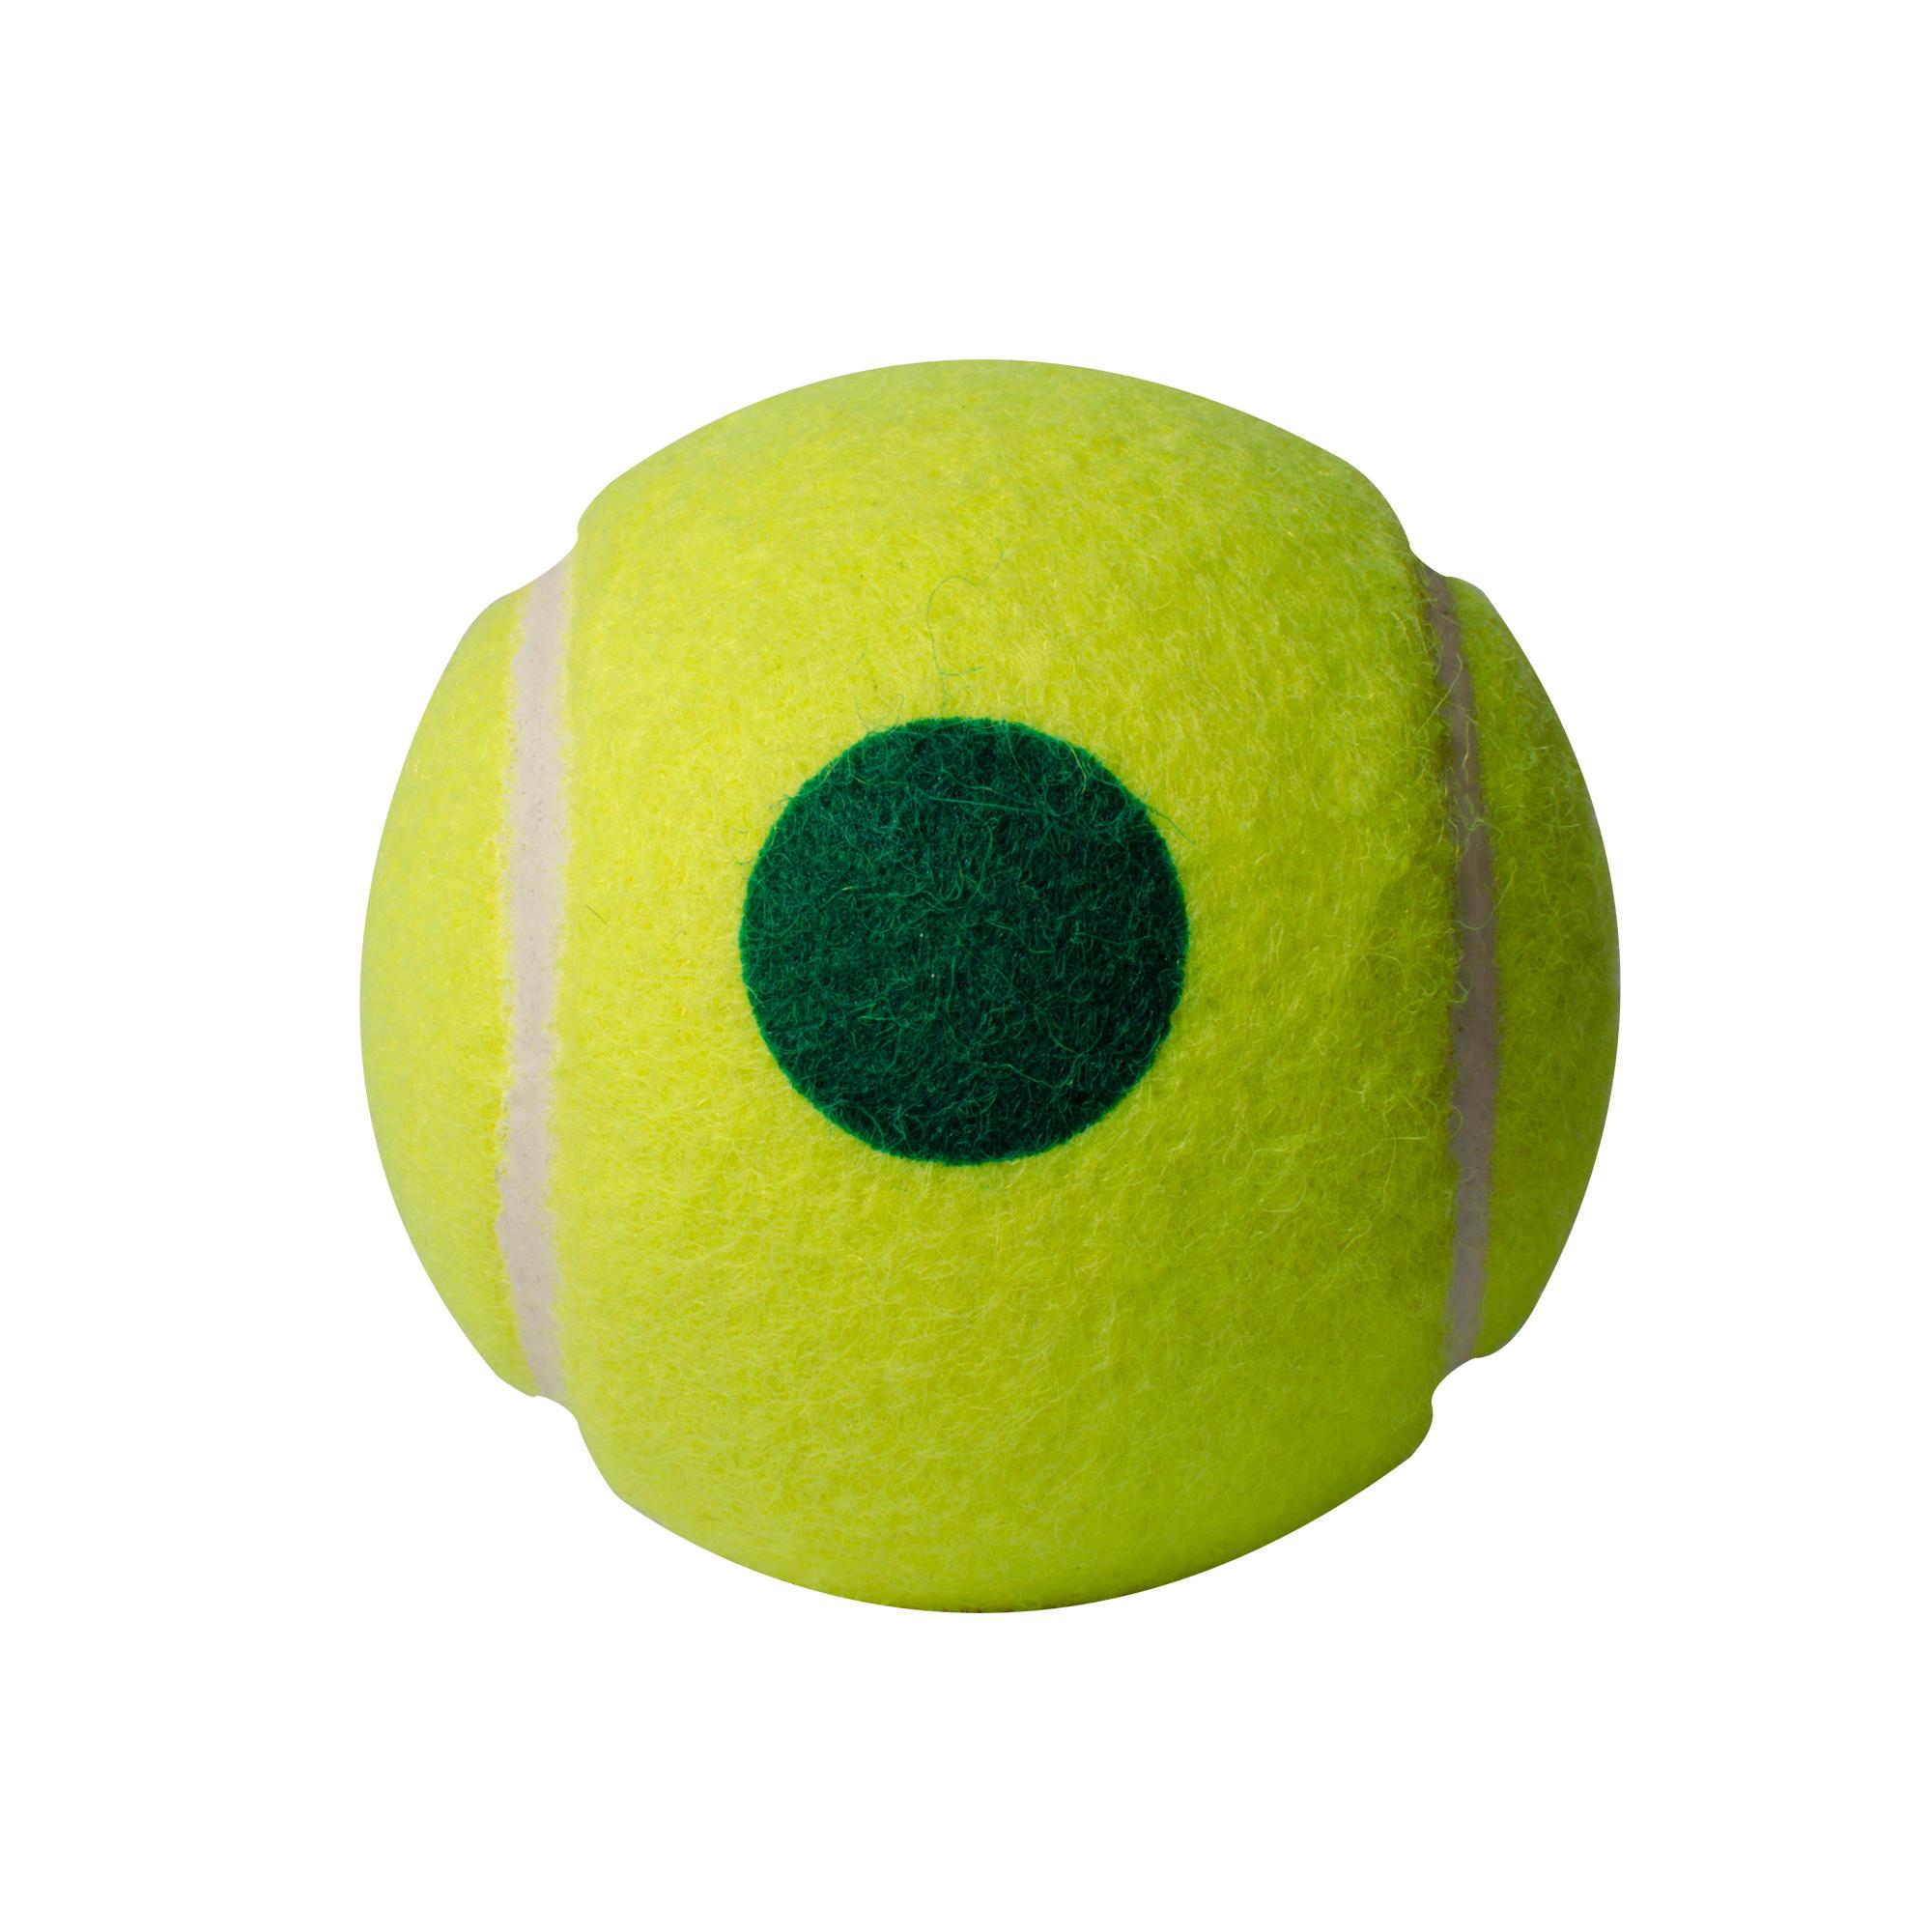 TB720 TENNIS BALL - YELLOW